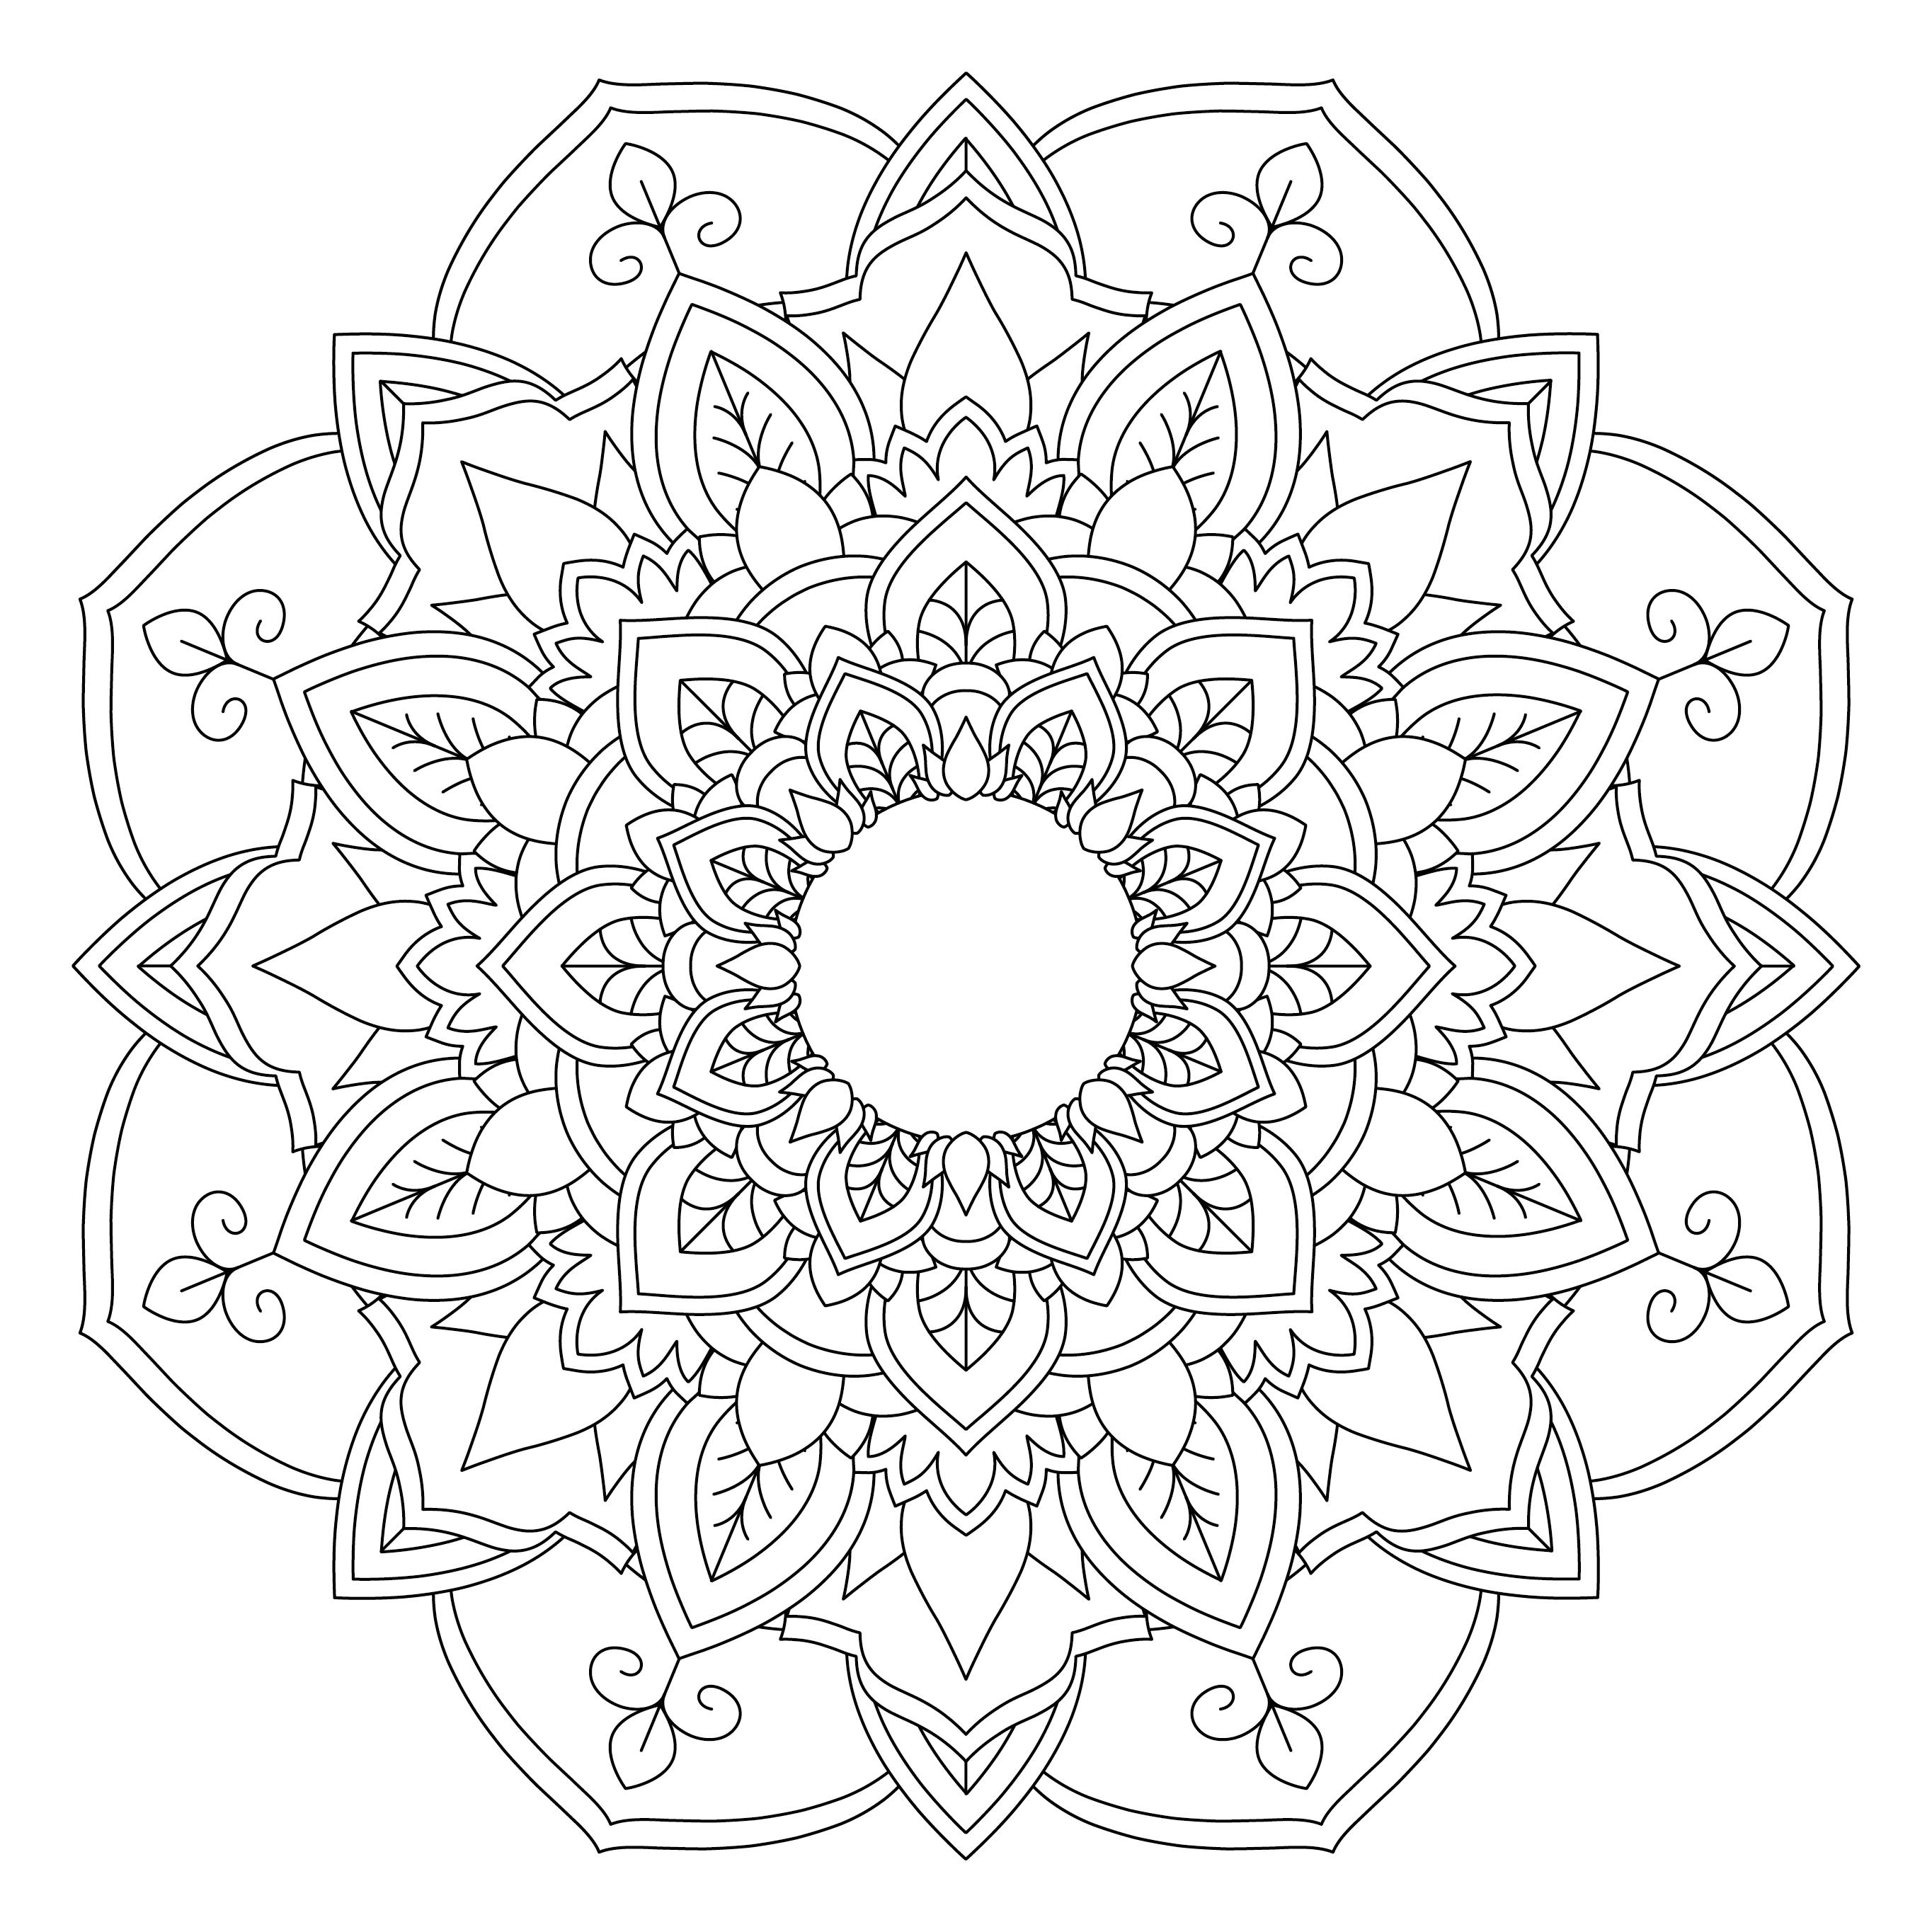 Mandala Monday 2 - Free Download To Colour In « Gentleman ...